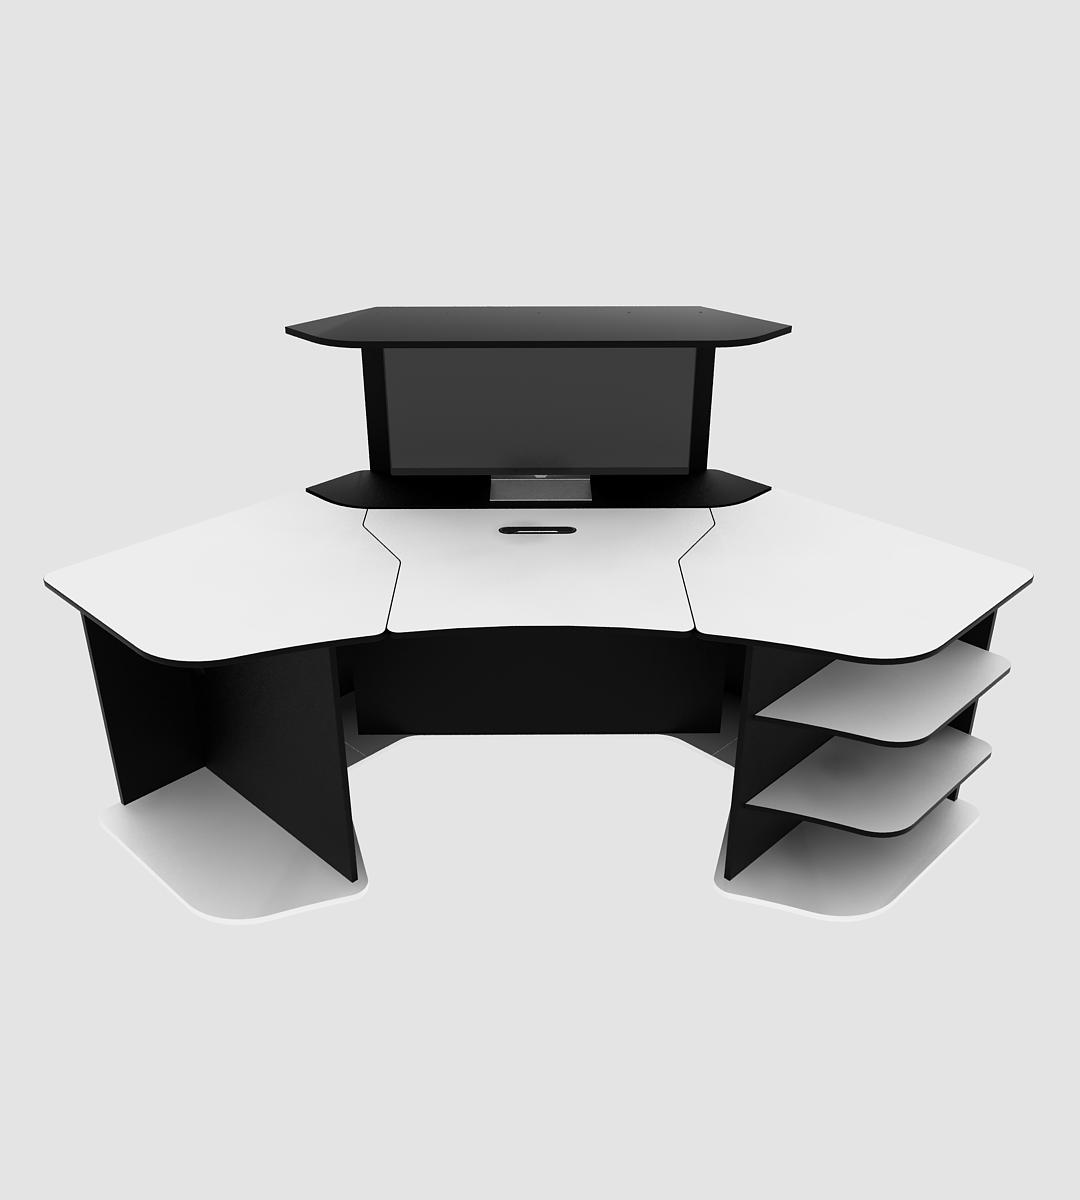 r2s astronaut h stylish ingenious table desk ideas. Black Bedroom Furniture Sets. Home Design Ideas